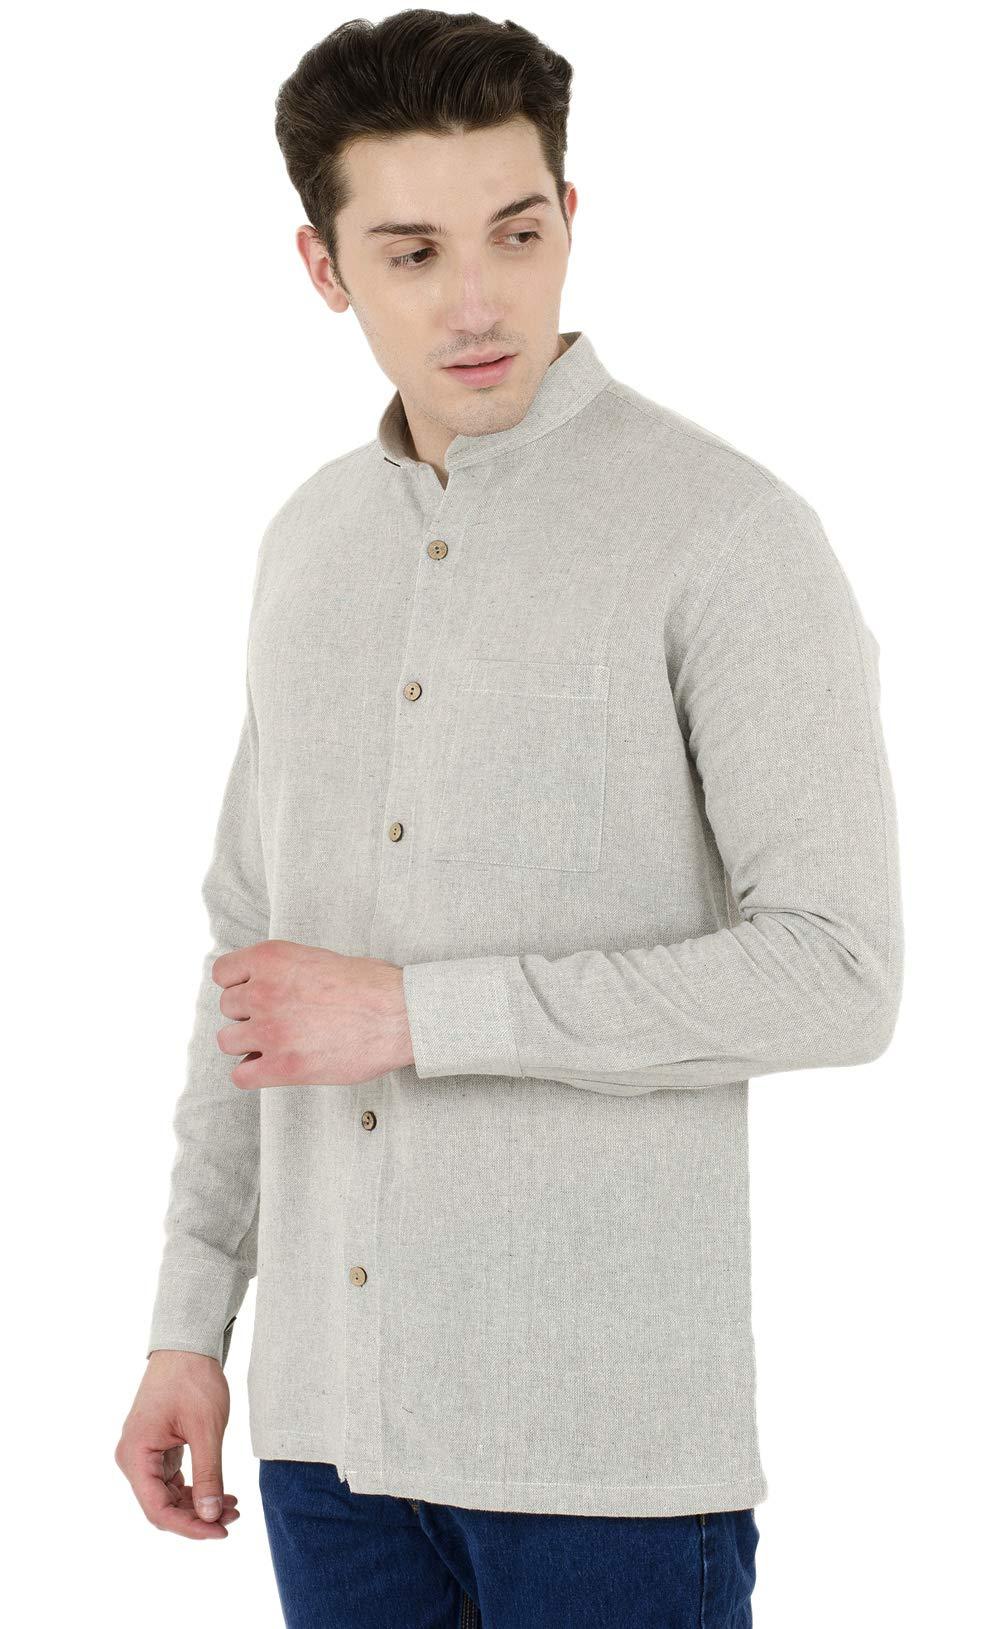 SKAVIJ Button Down Shirts for Men Cotton Long Sleeve Casual Shirts Regular Fit Grey by SKAVIJ (Image #4)